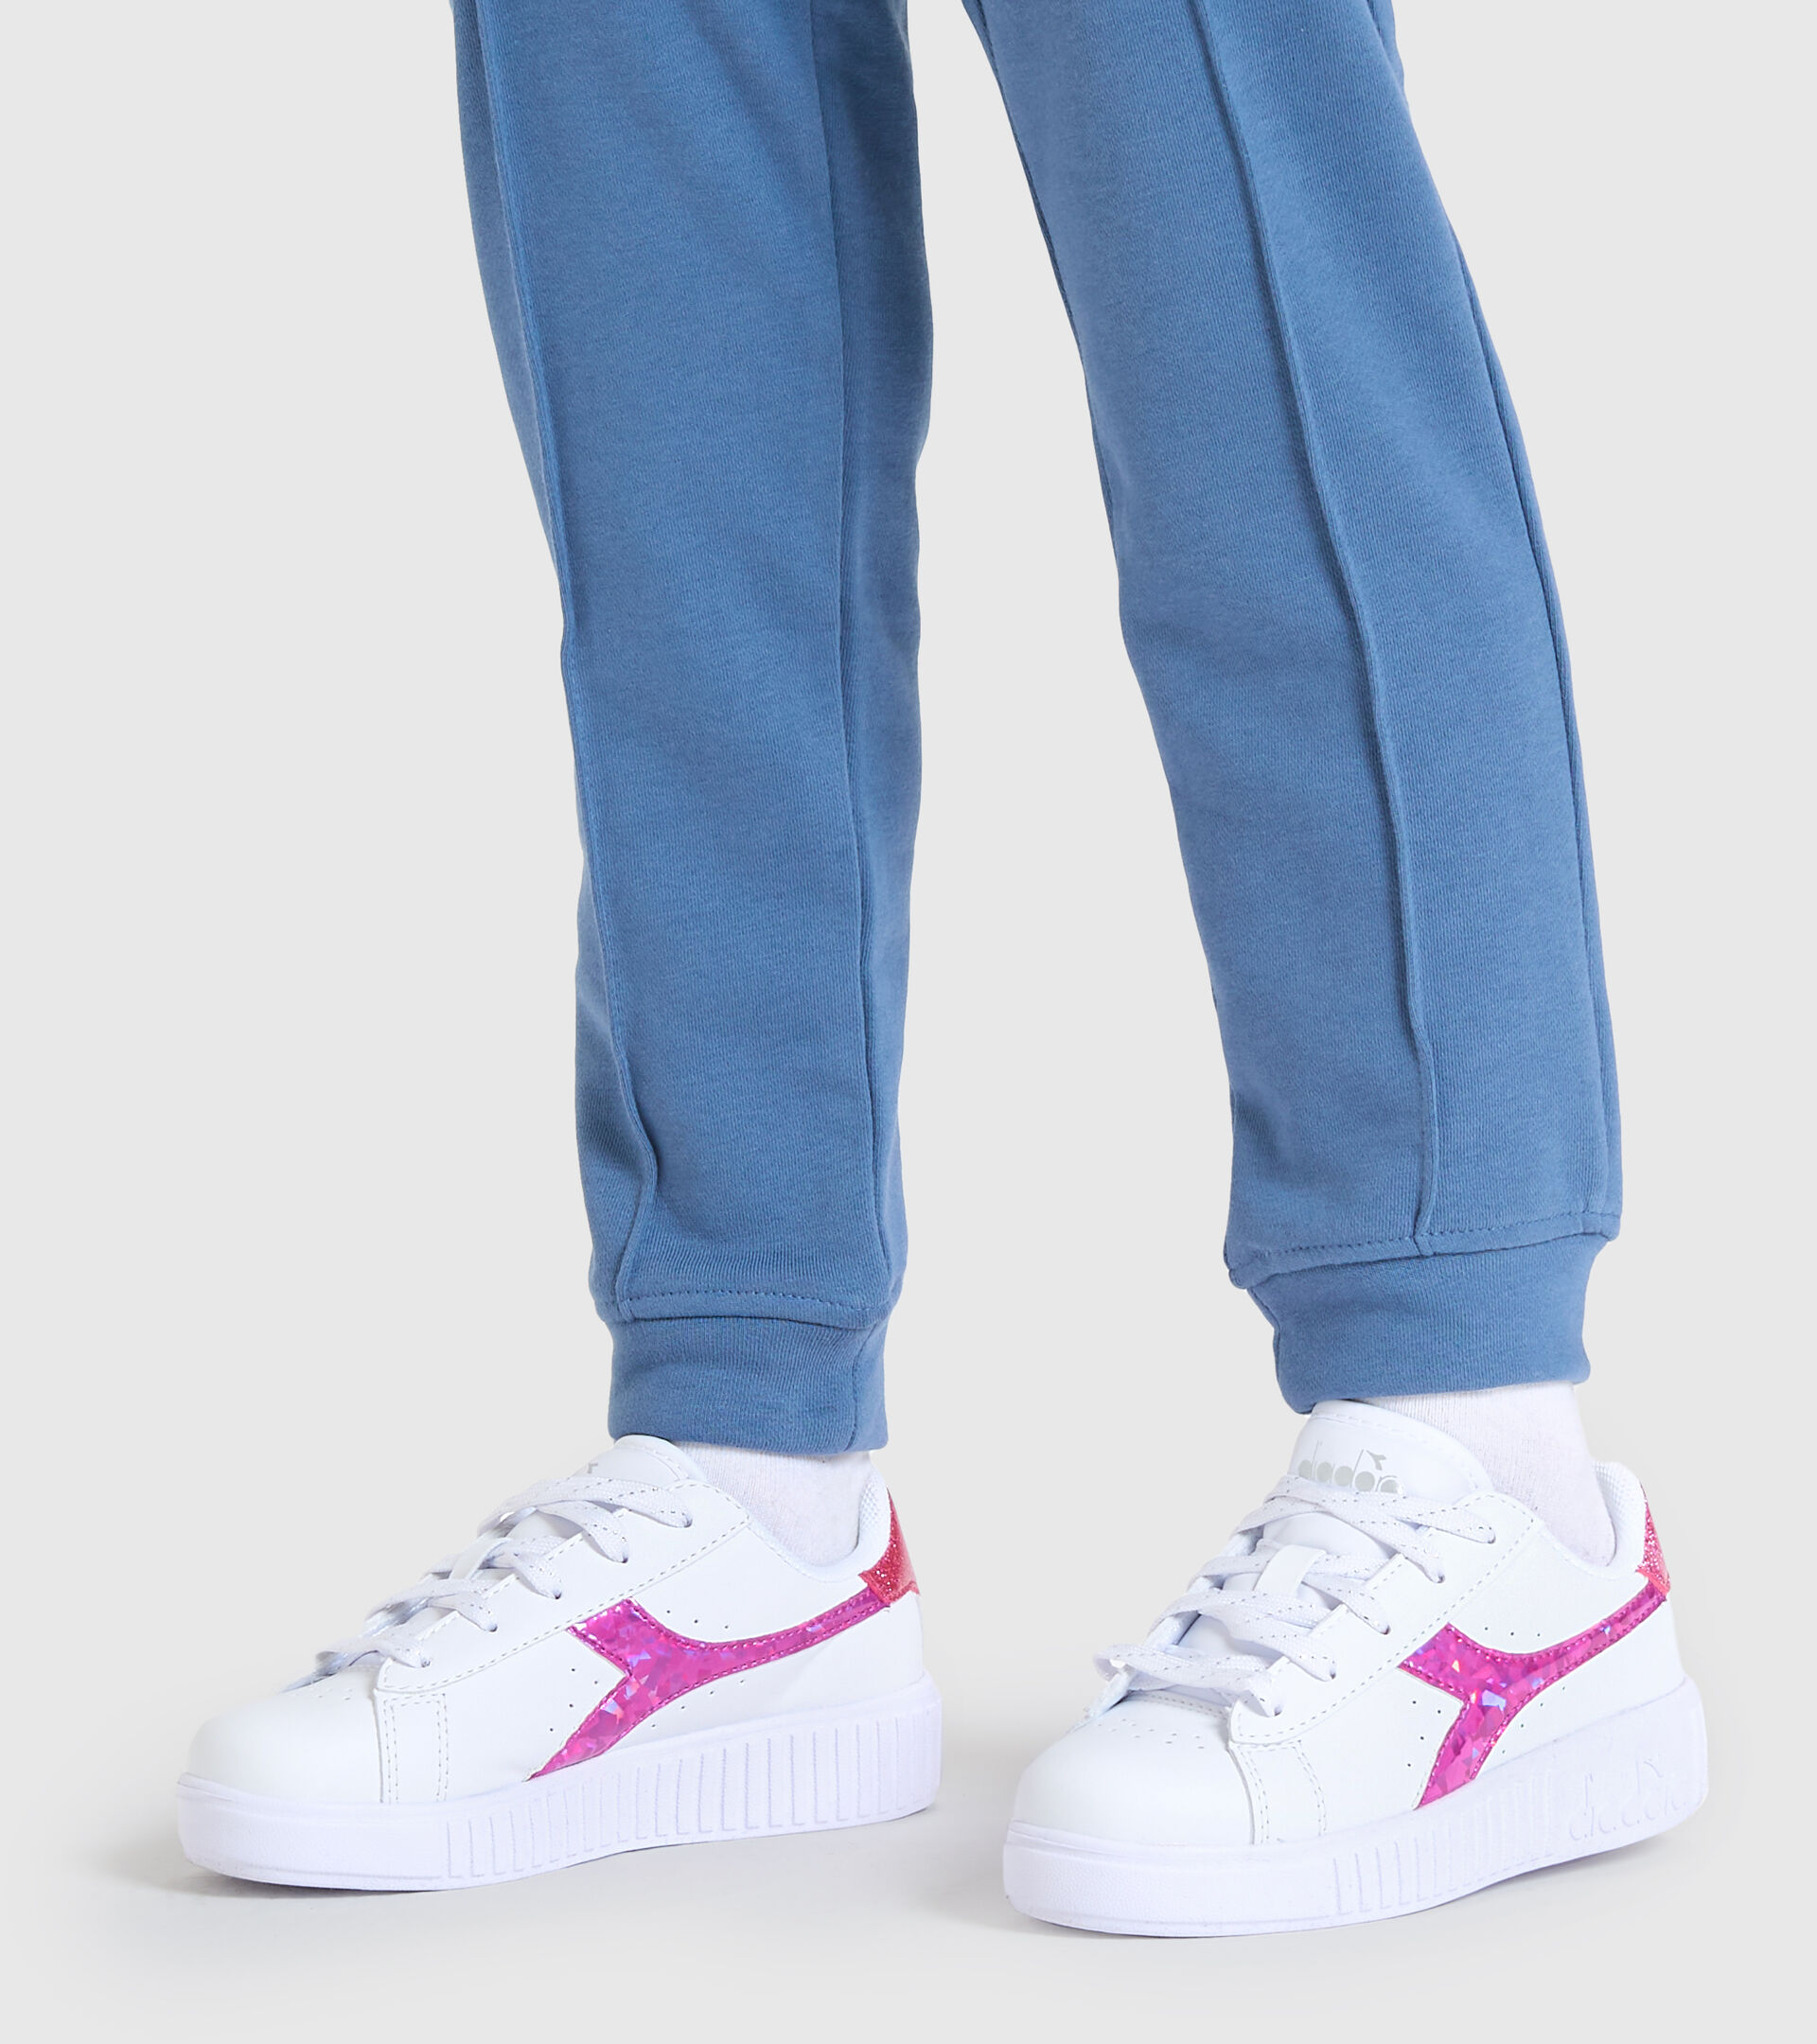 Sports shoes - Kids 4-8 years GAME STEP DIAMONDS PS WHITE/FUCHSIA PINK - Diadora